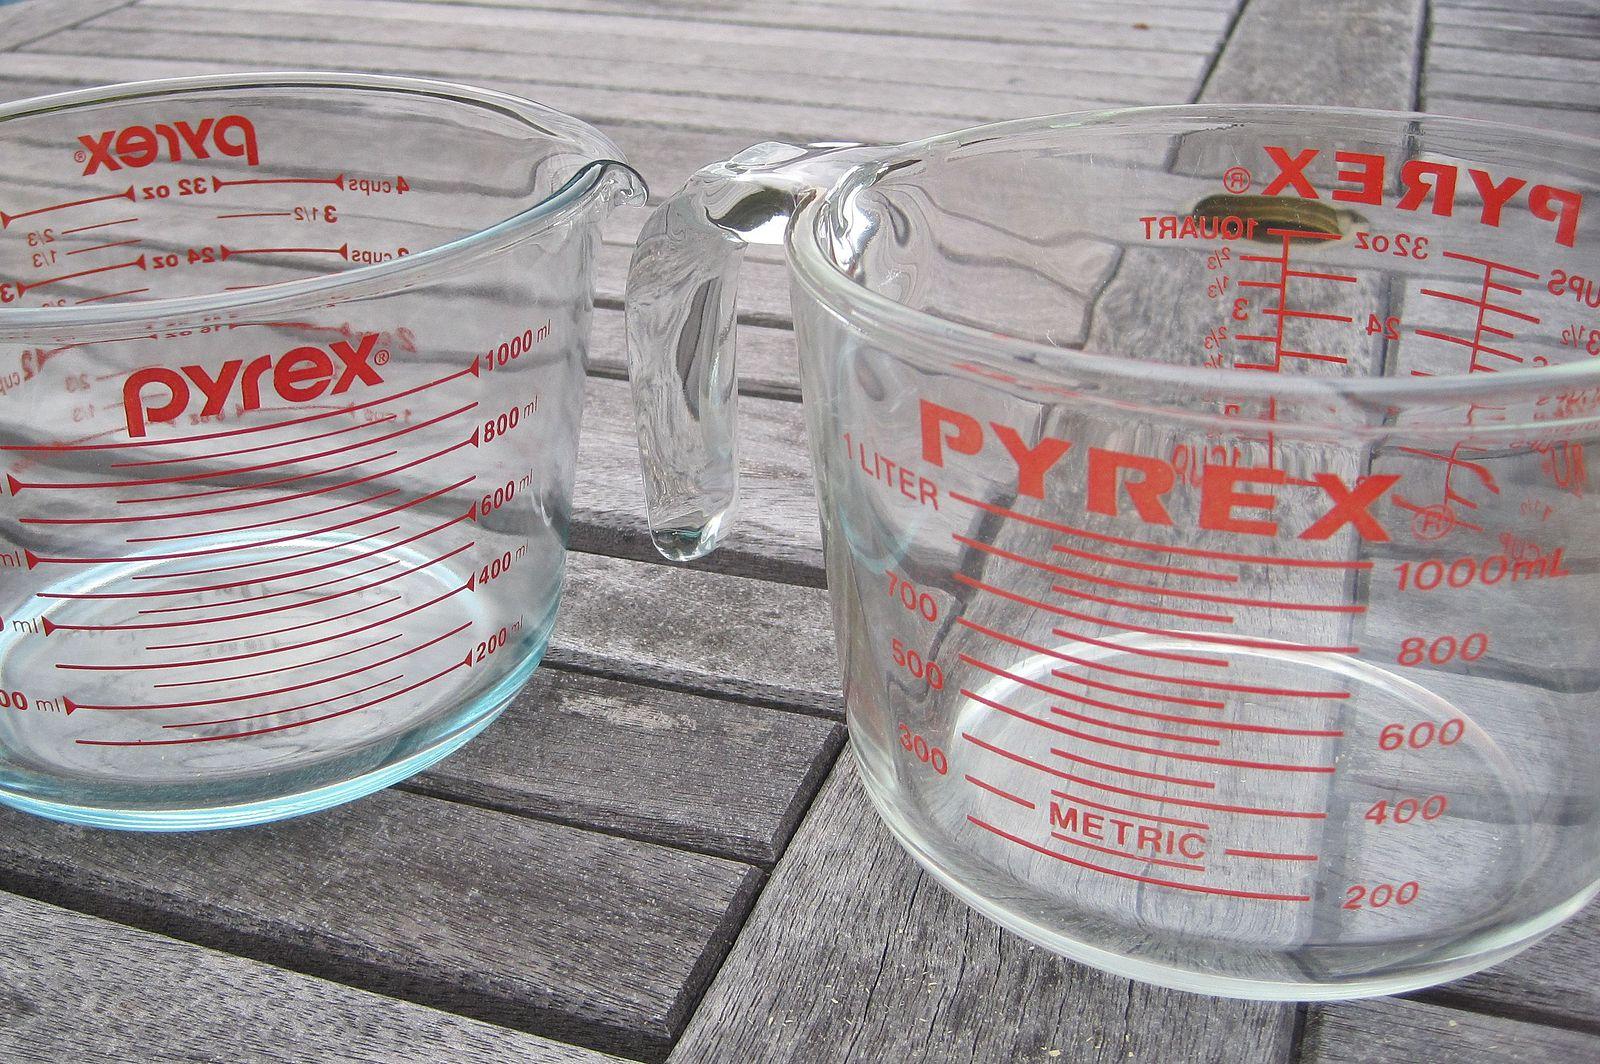 Pyrex measuring cups